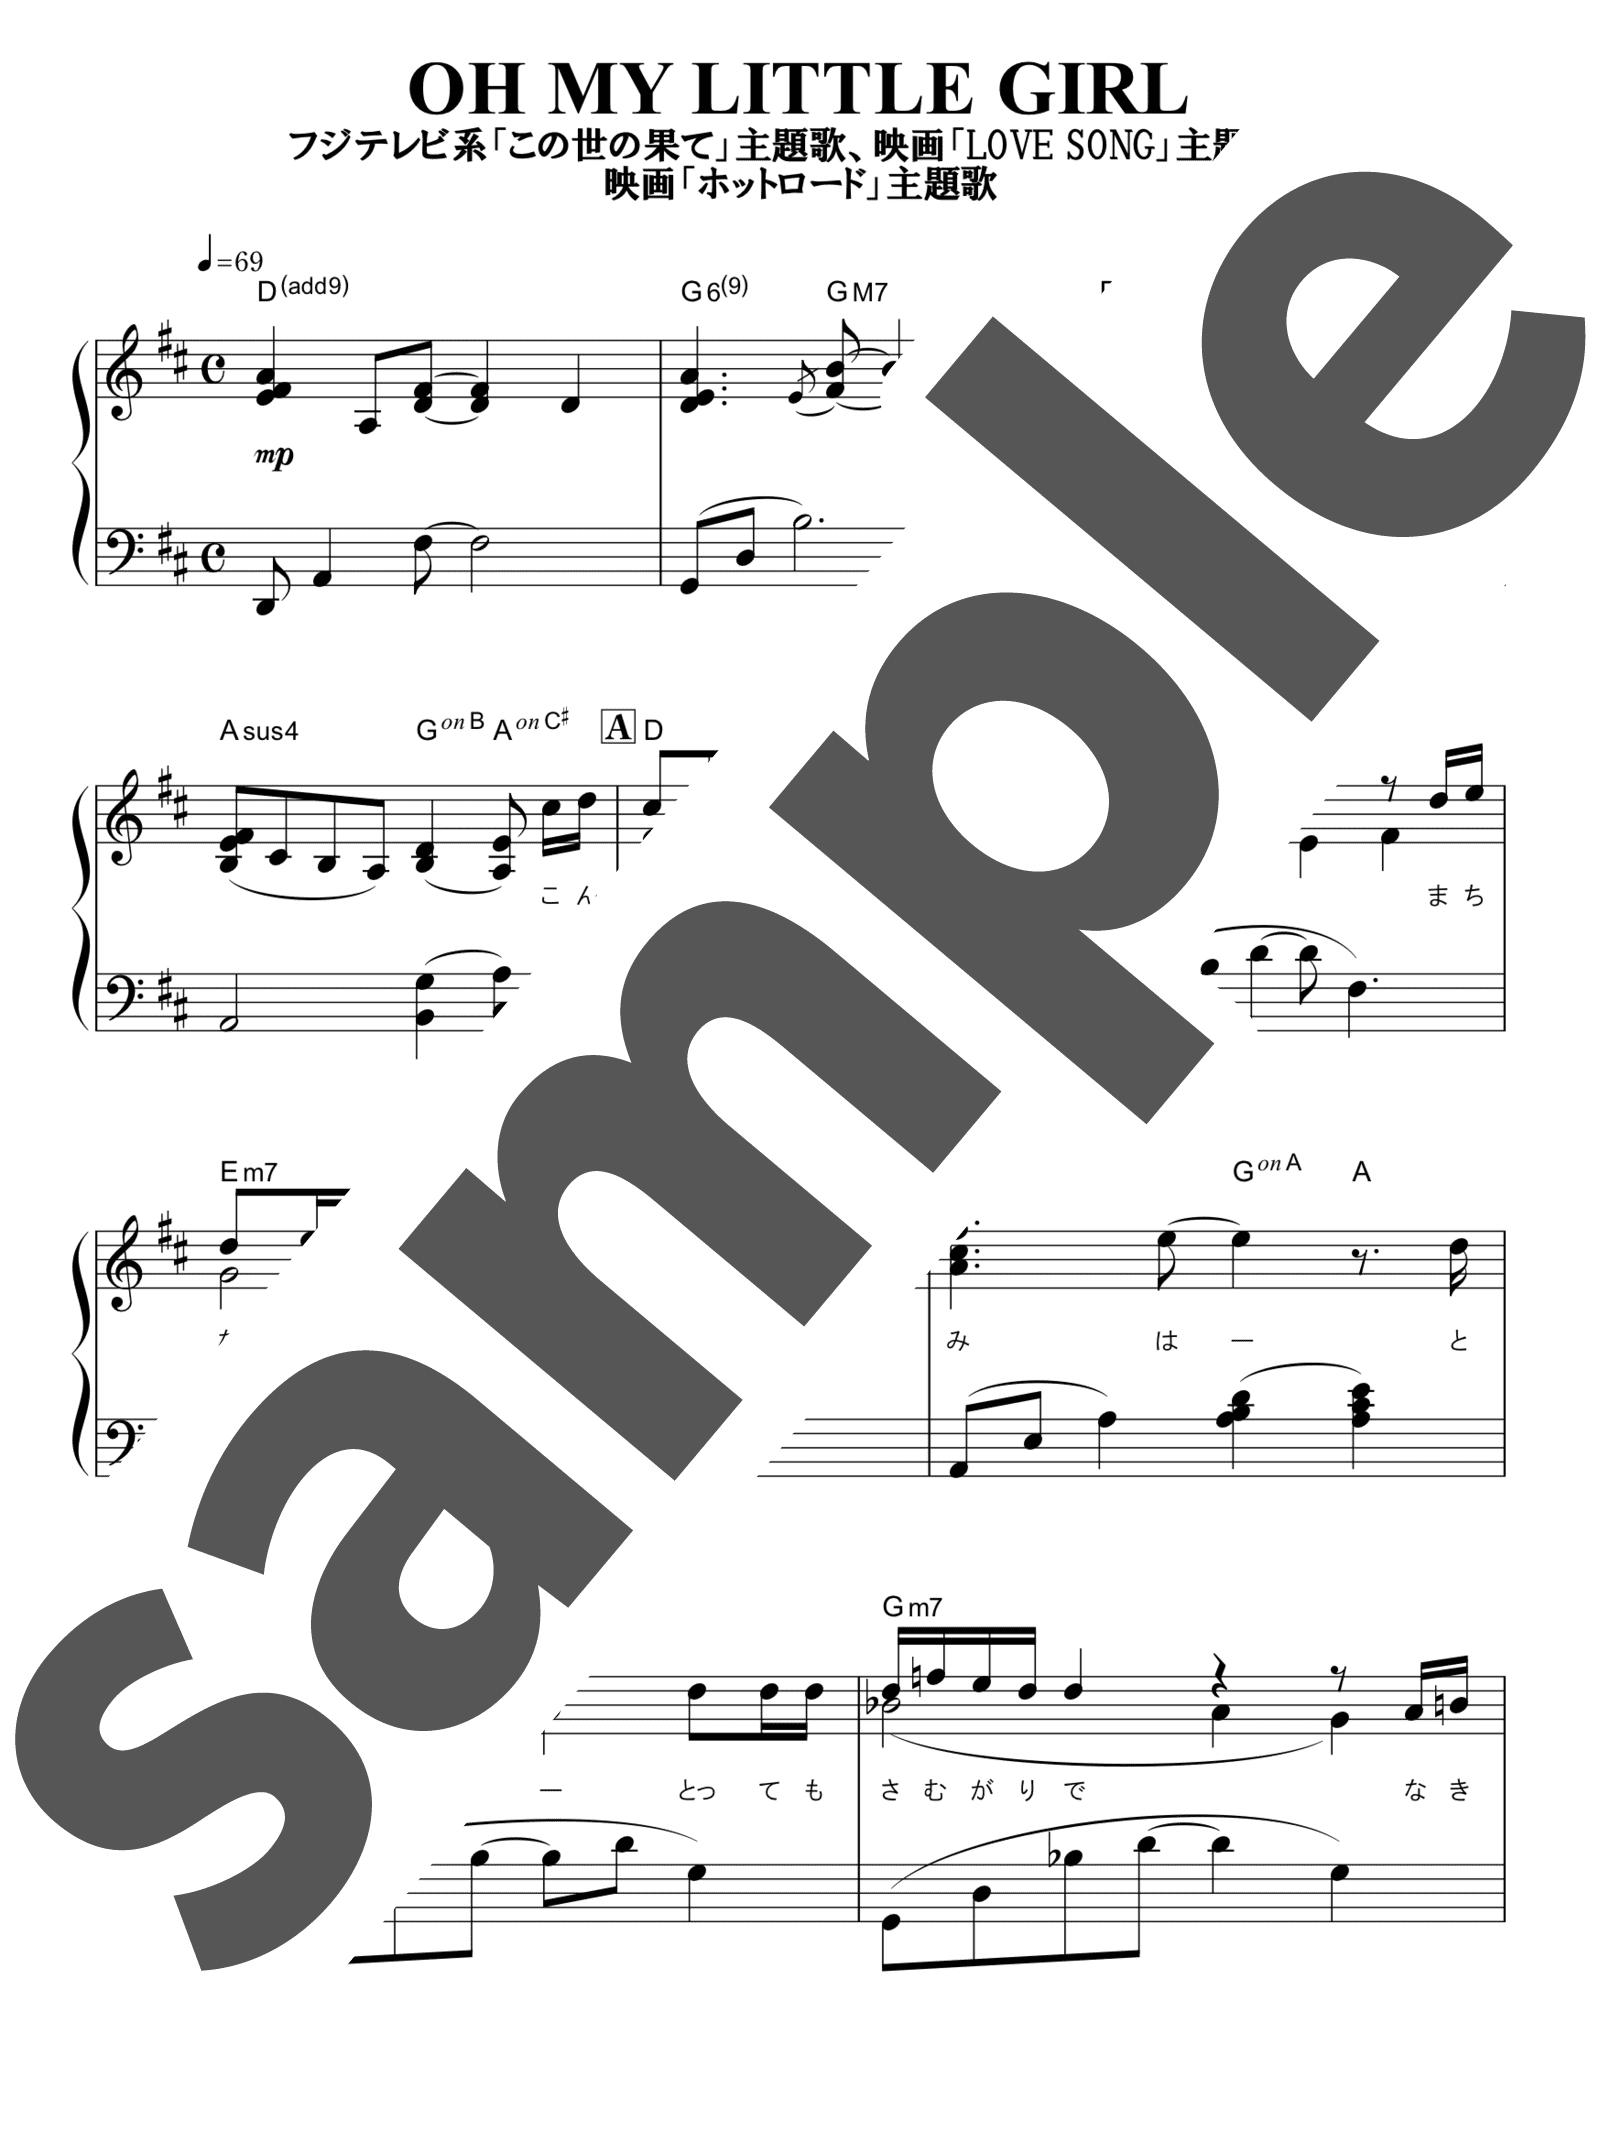 「OH MY LITTLE GIRL」のサンプル楽譜